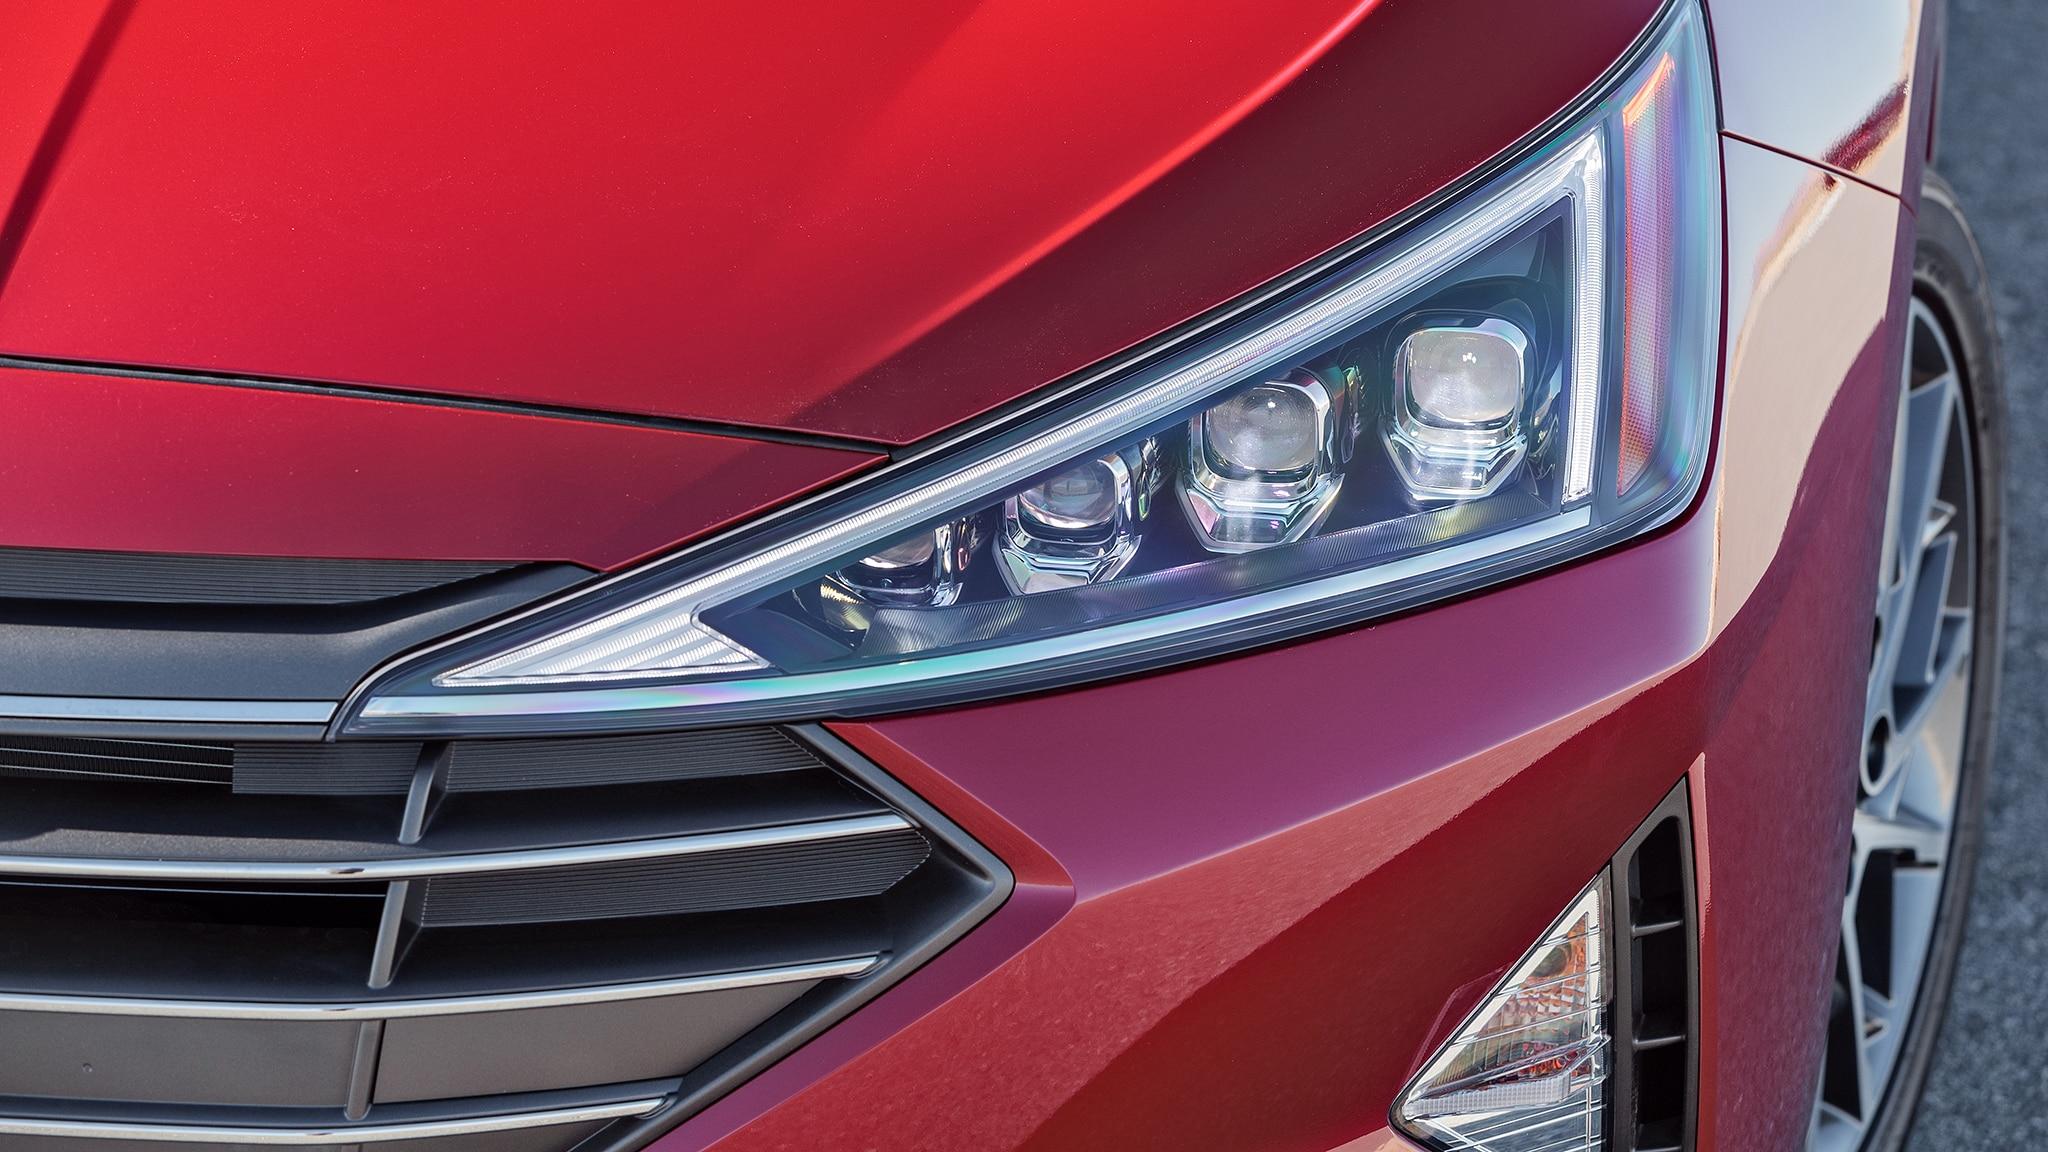 2019 Hyundai Elantra Limited Headlight Motor Trend En Espanol